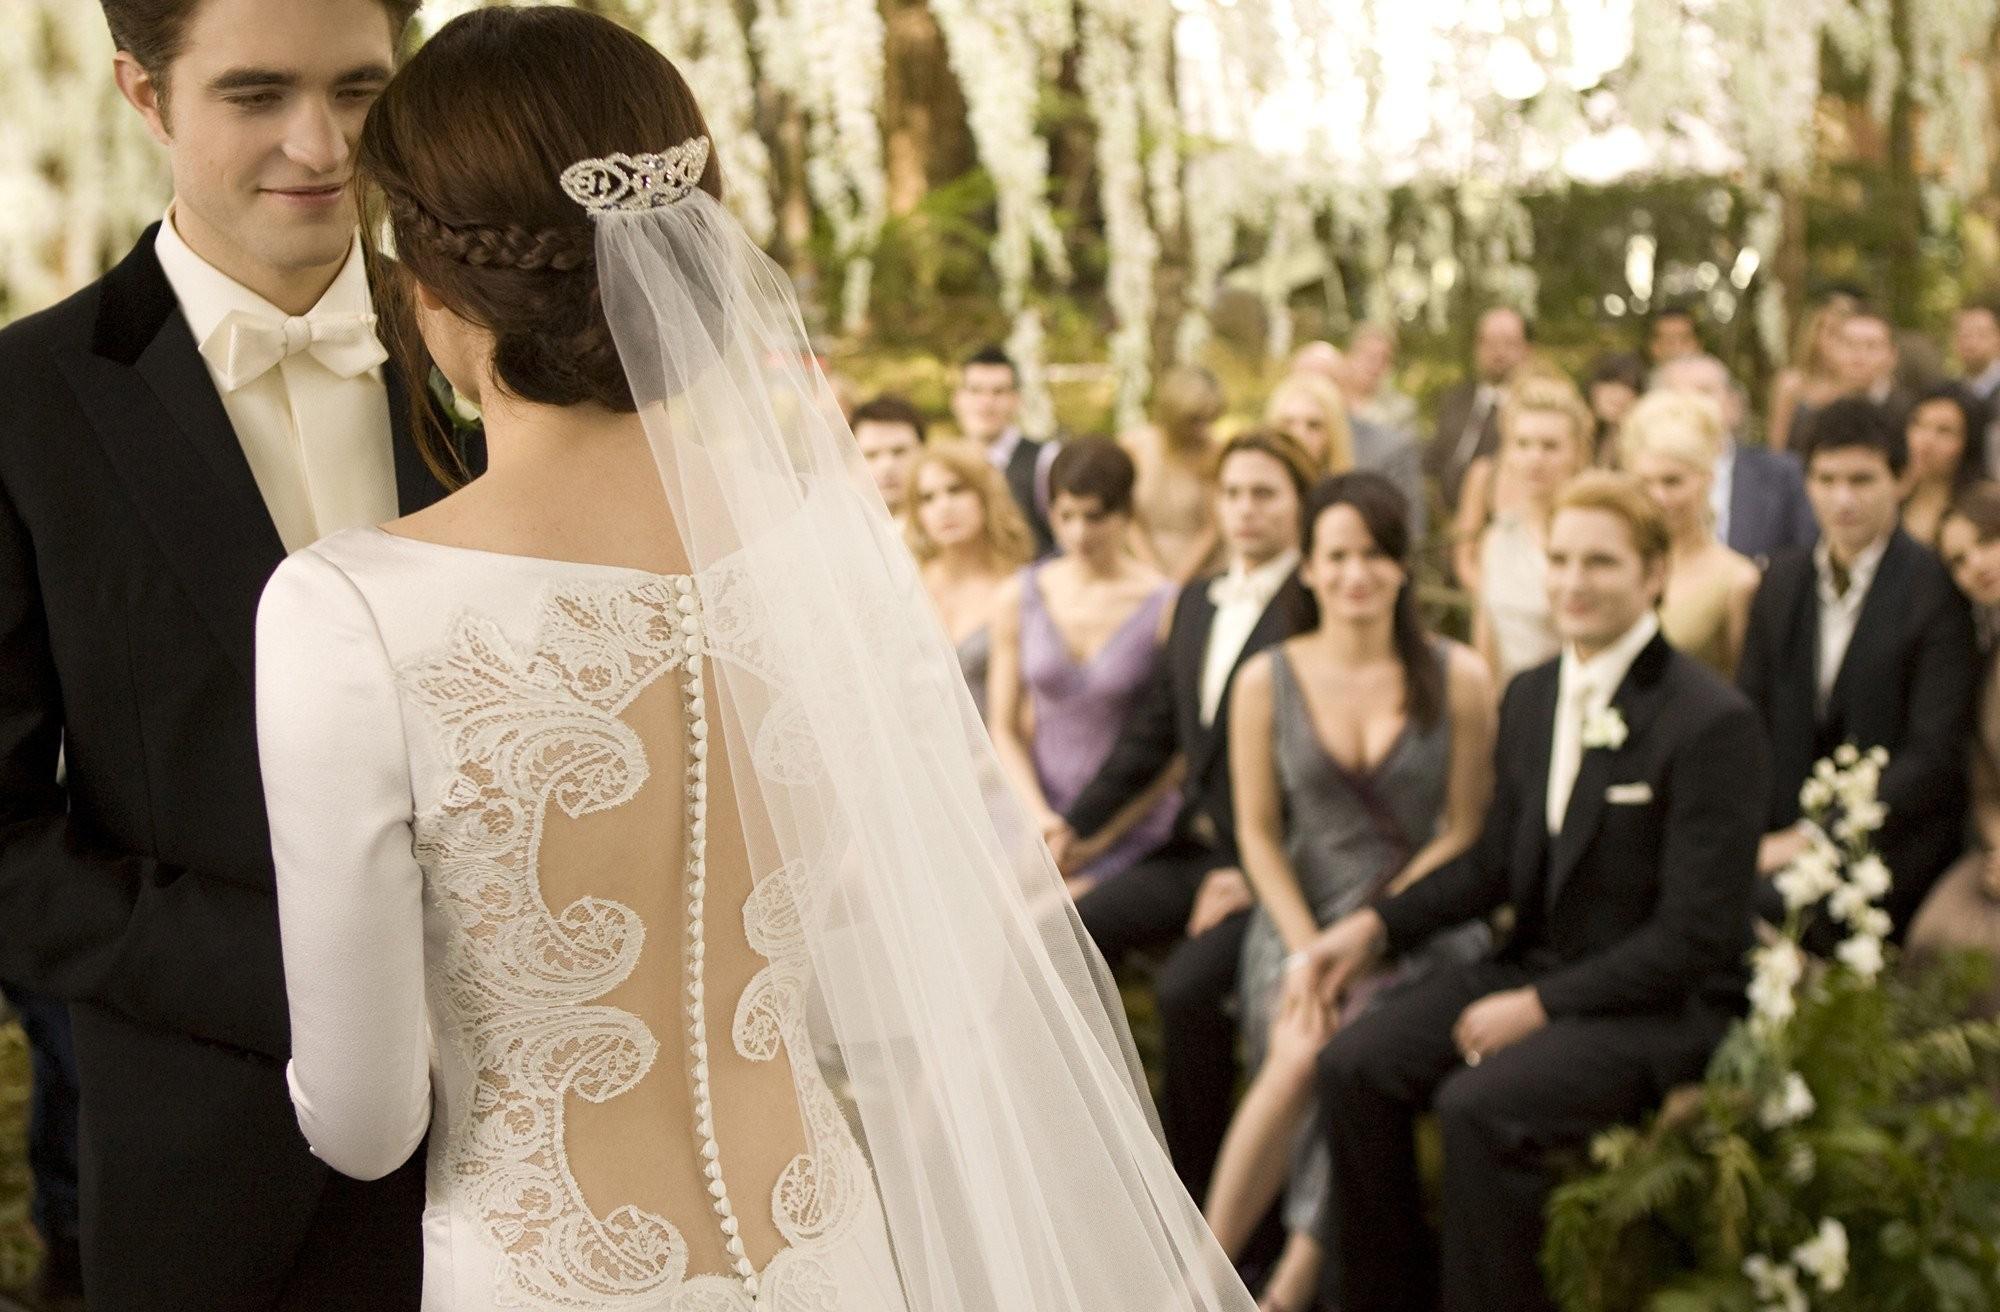 Breaking Dawn Part 2 Wedding - HD Wallpaper